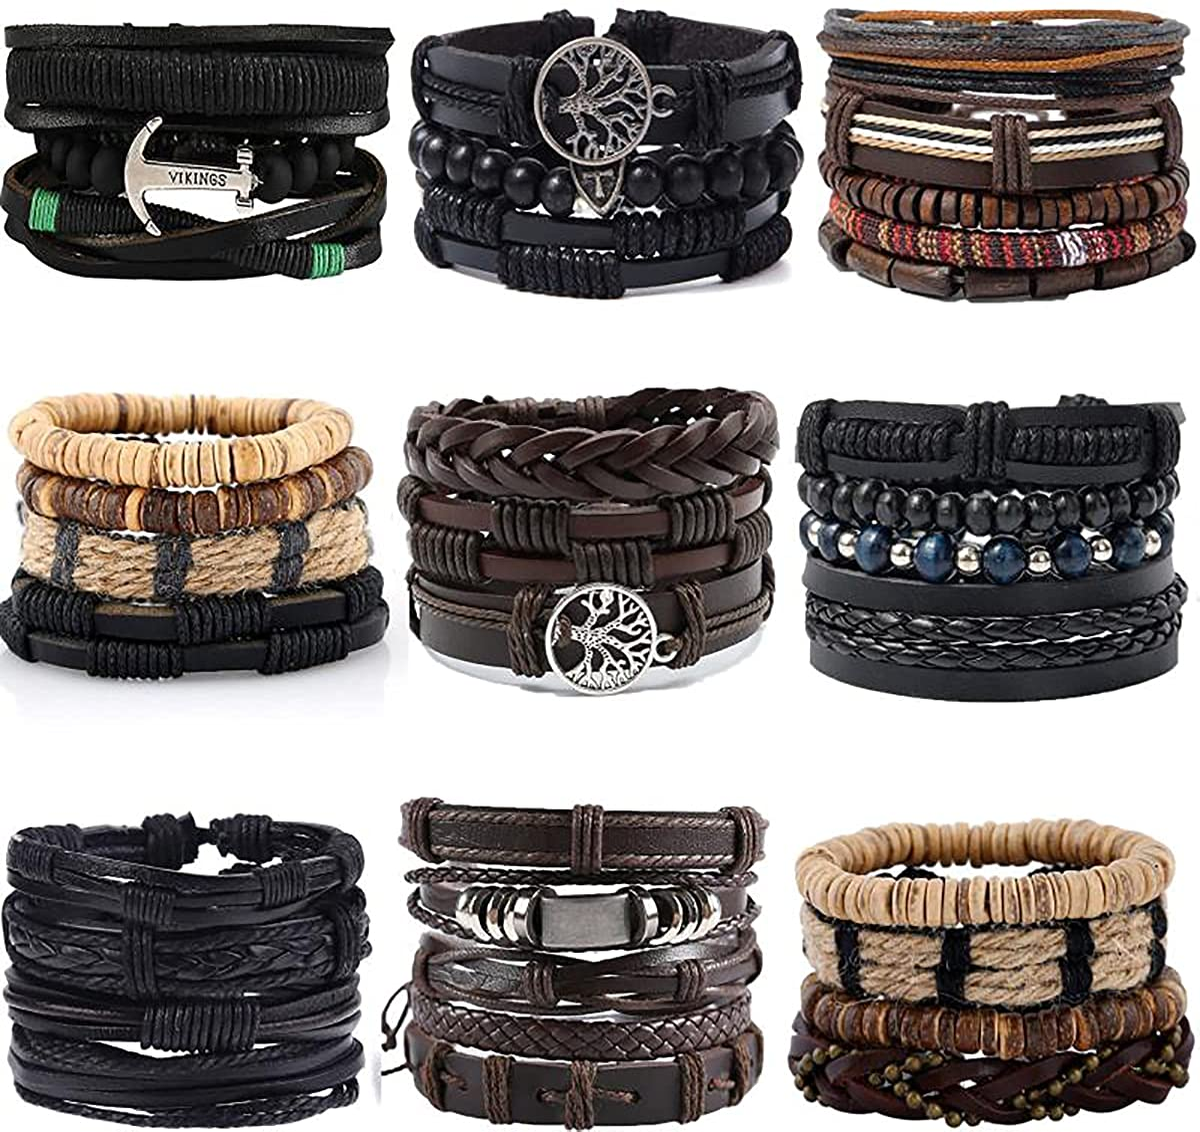 JEWPARK 36PCS Attention brand Woven Leather Bracelet Set Men Brai OFFicial store Cool Women for